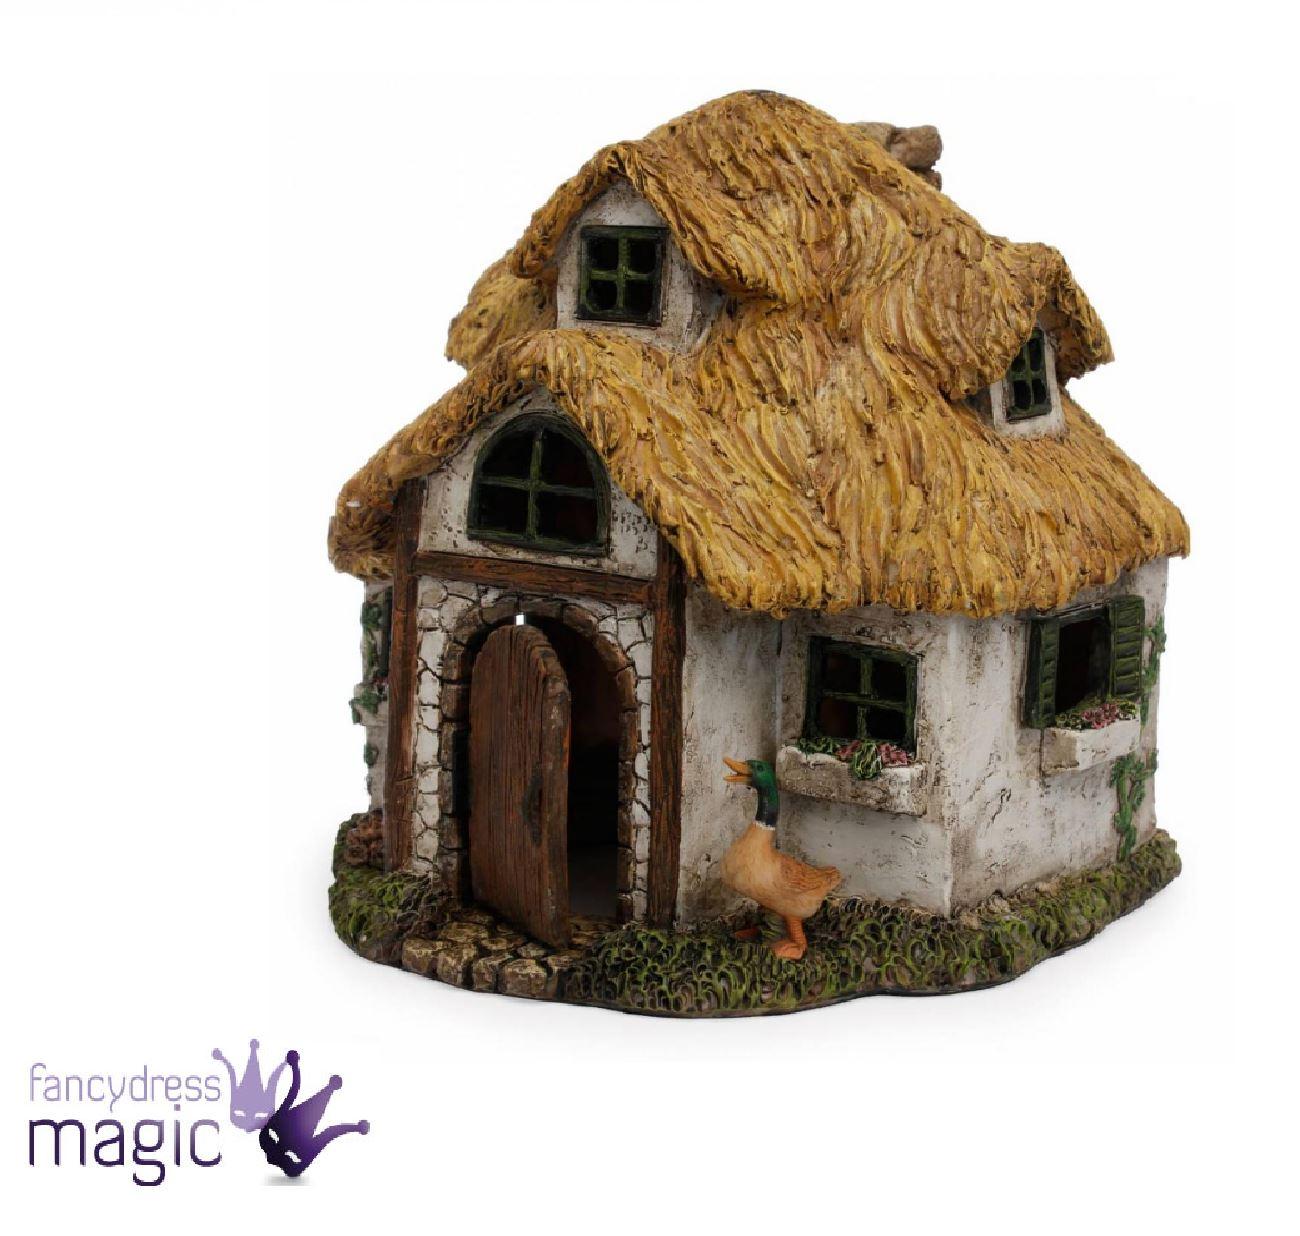 miniature micro mini fairy garden furniture accessory. Black Bedroom Furniture Sets. Home Design Ideas